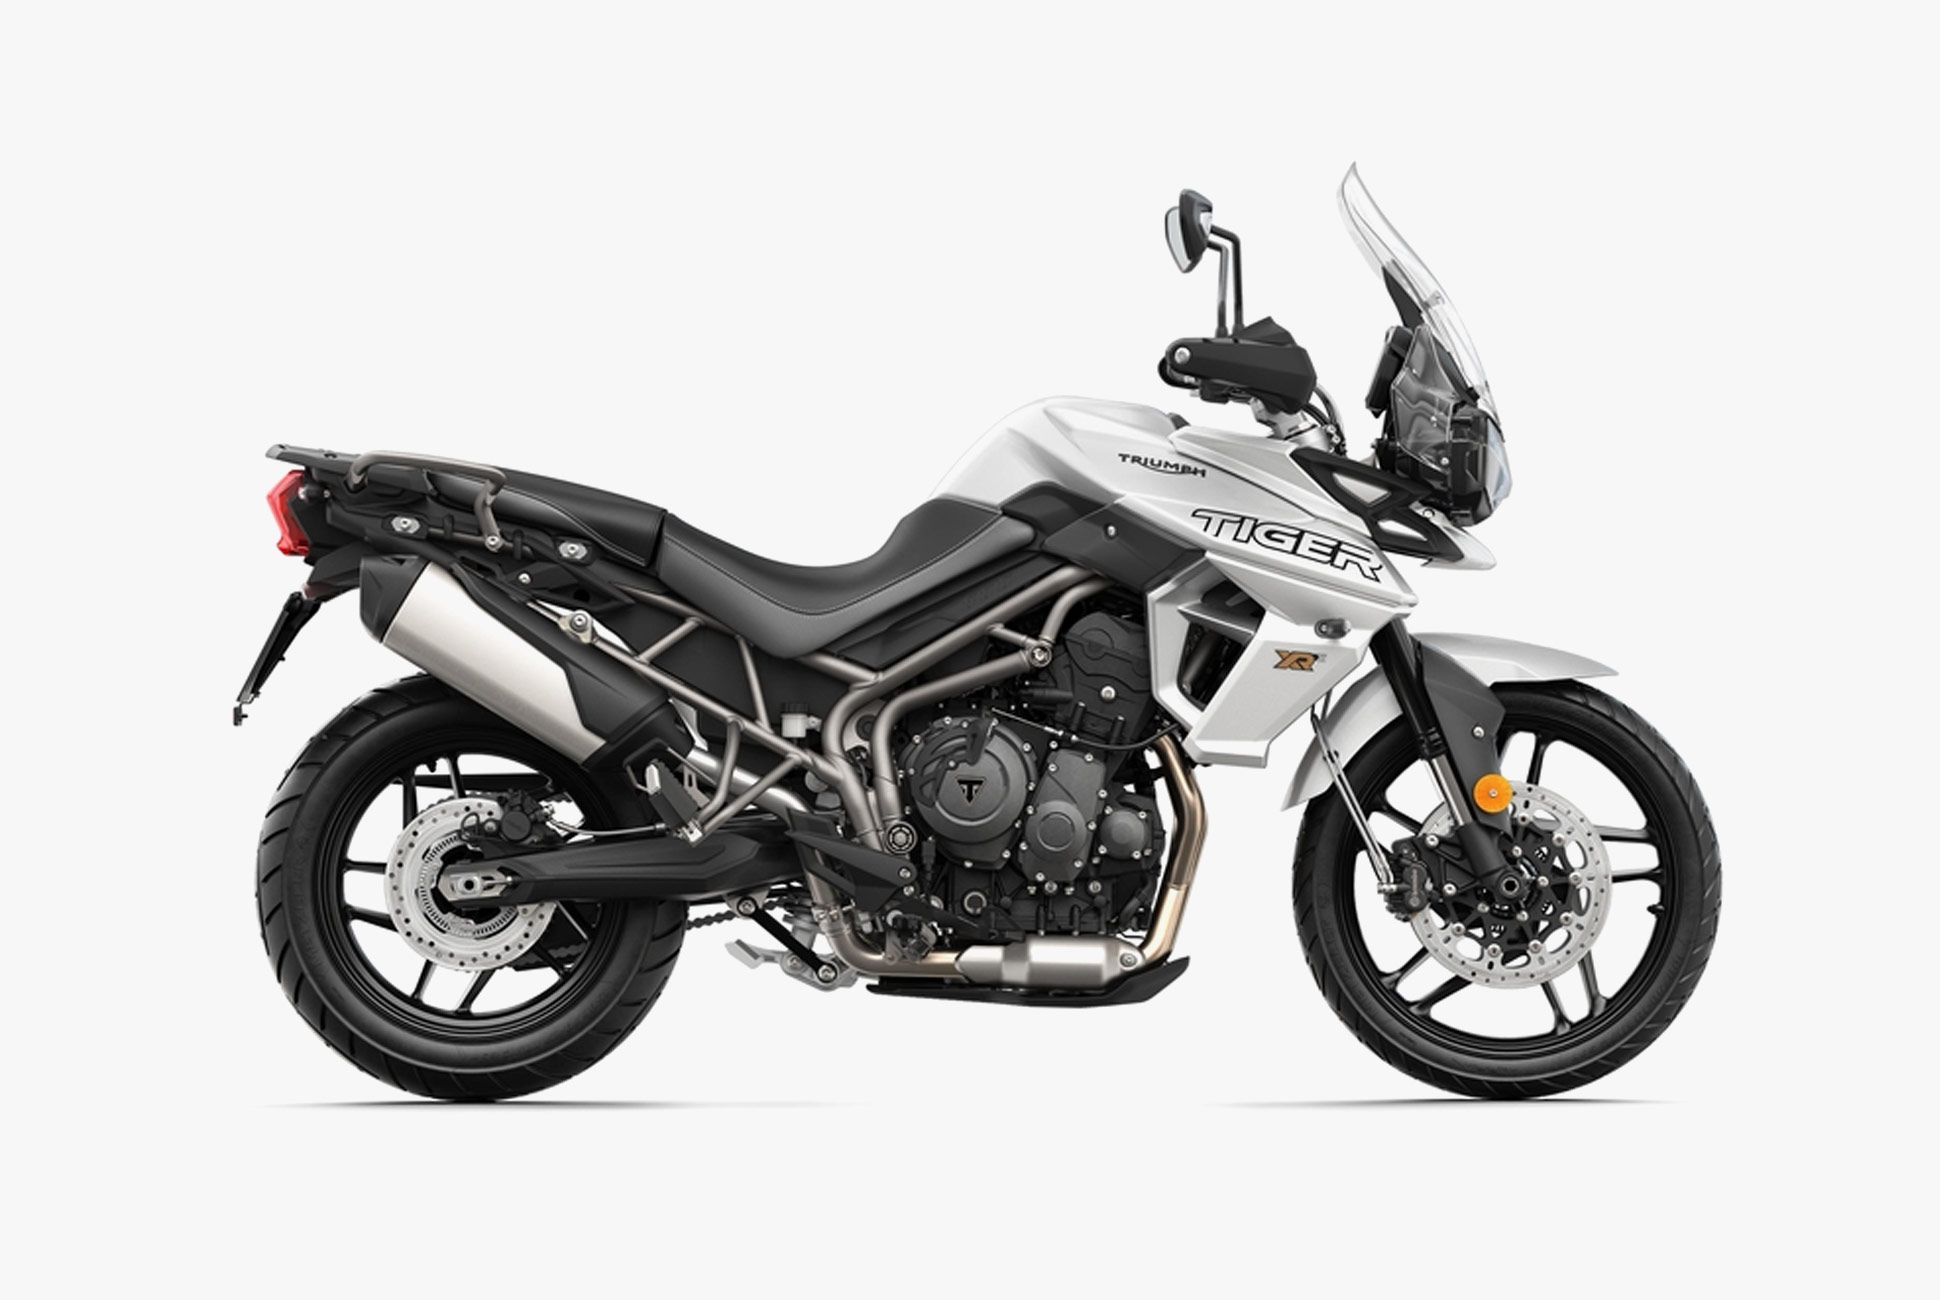 Awe Inspiring The 16 Best Motorcycles For Shorter Riders Gear Patrol Inzonedesignstudio Interior Chair Design Inzonedesignstudiocom